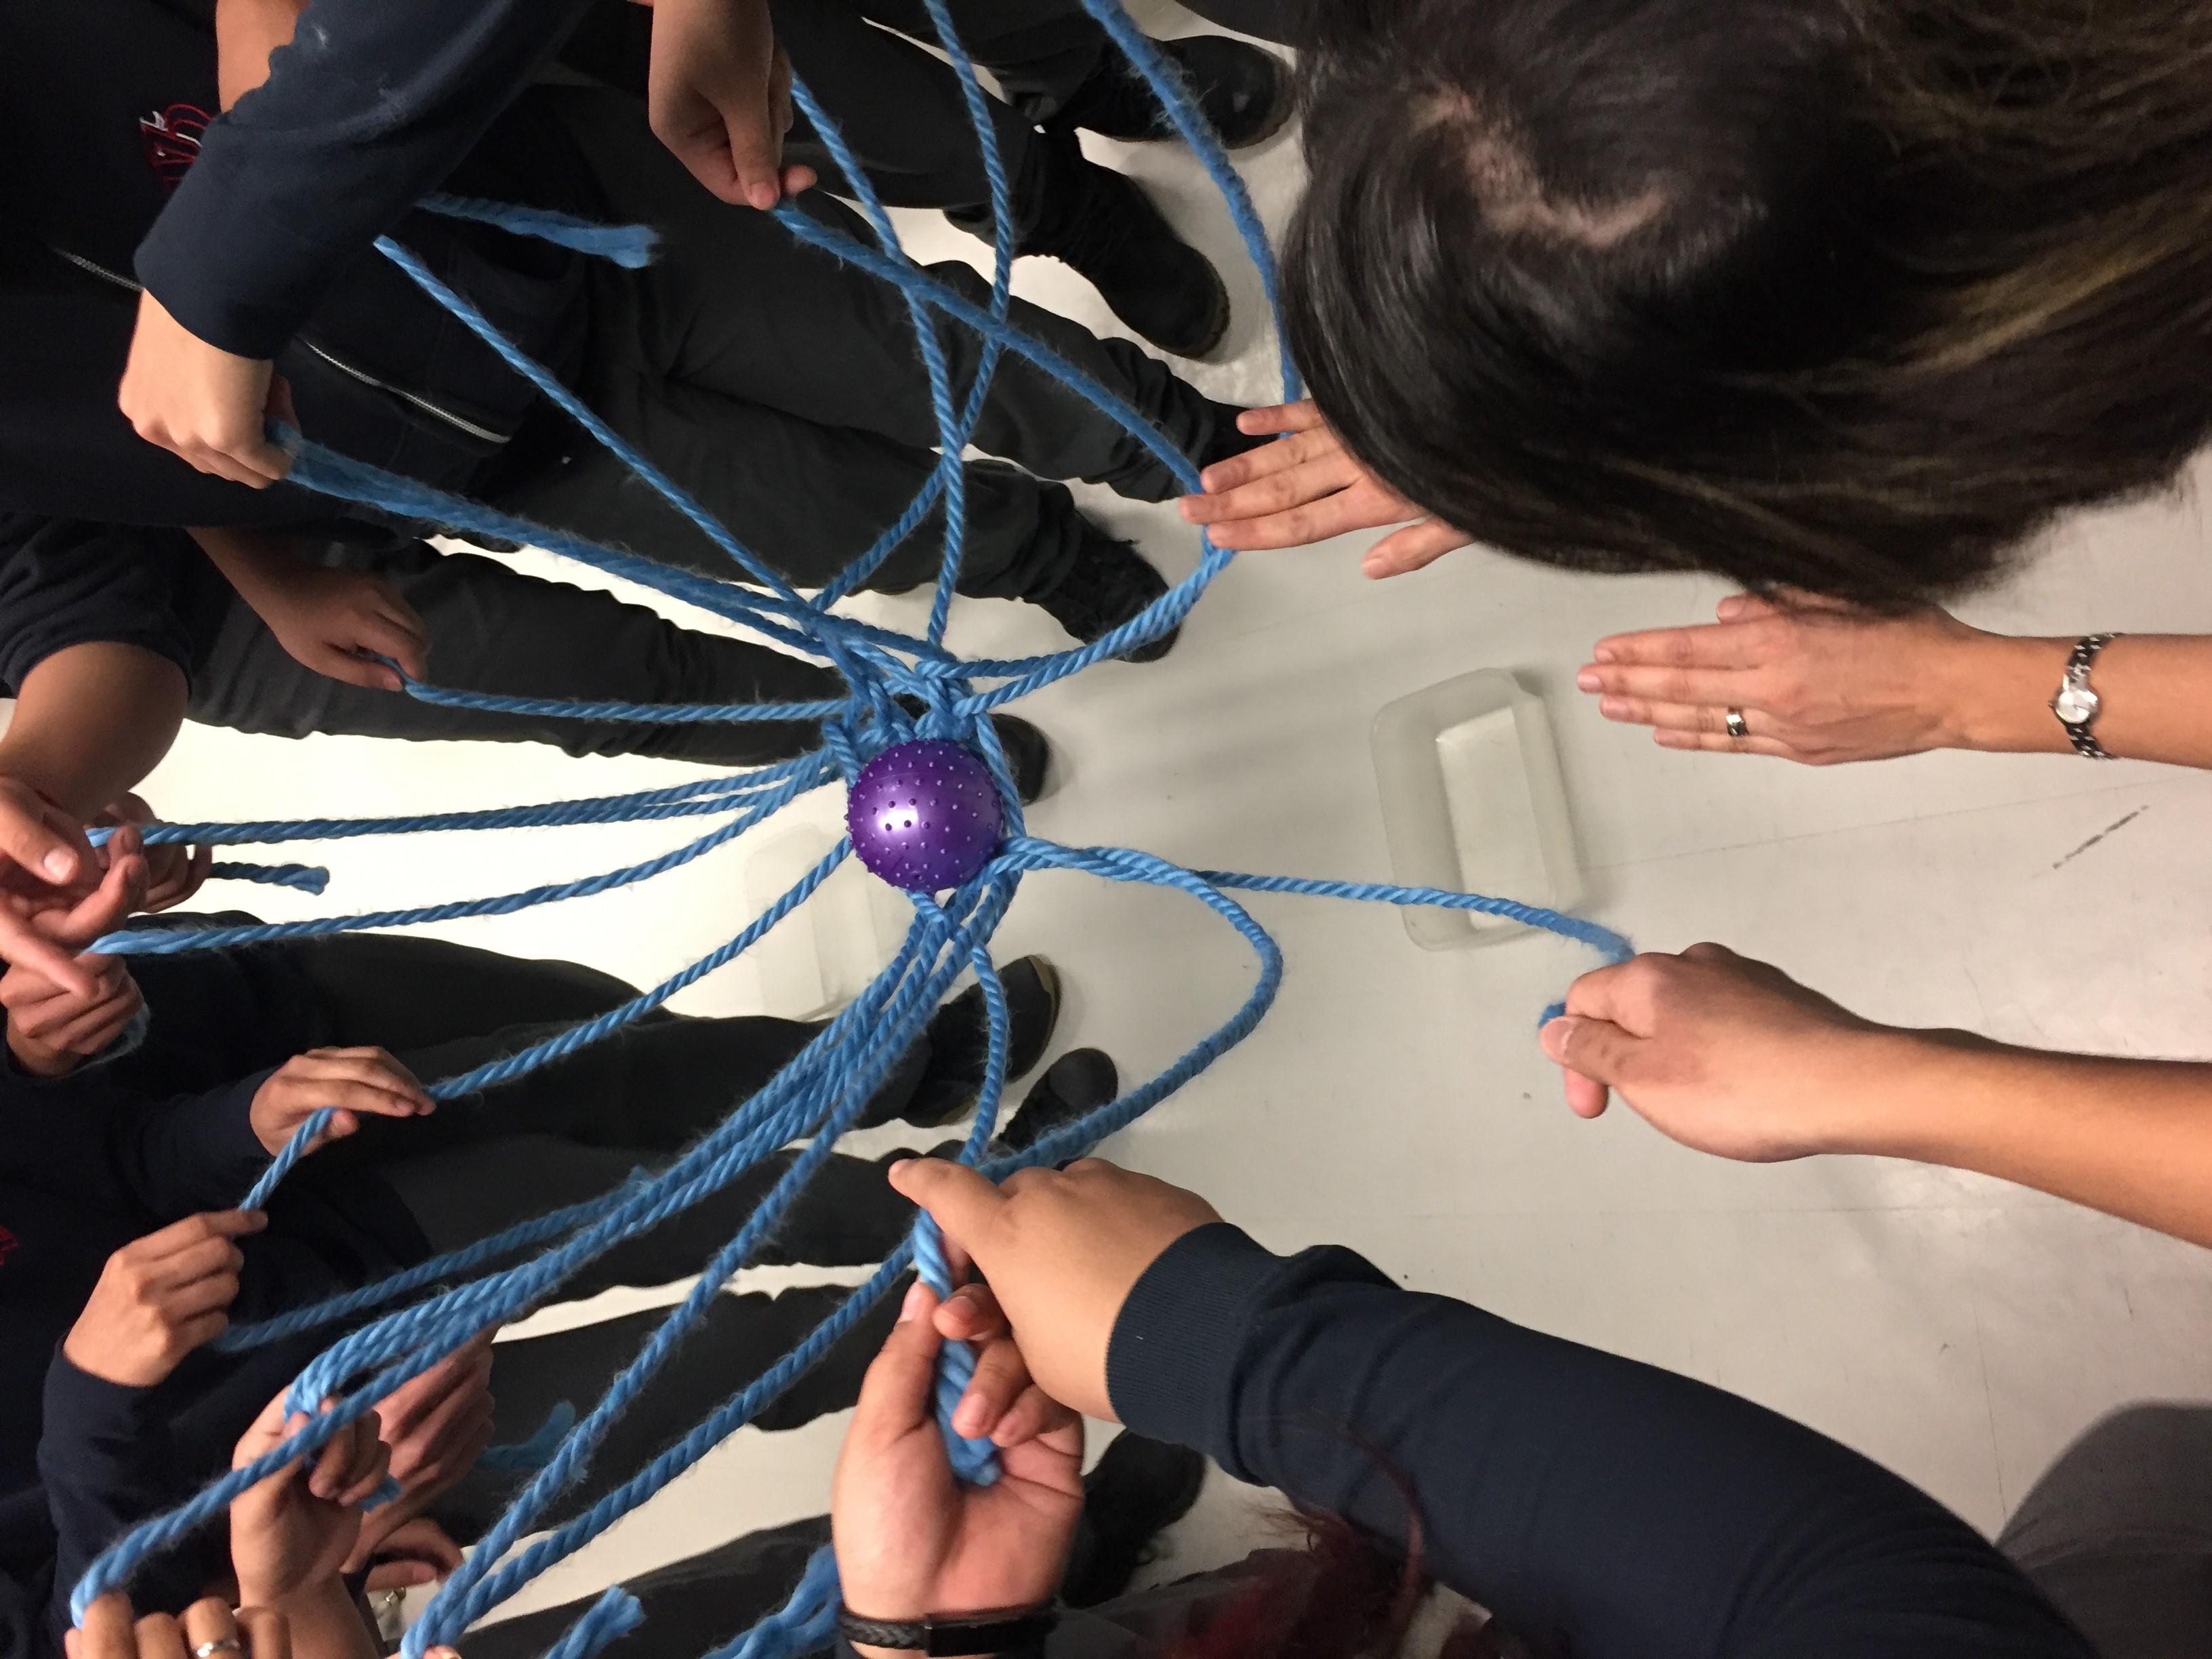 Web of Strings activity in Storytelling Co-design Workshops - Spring 2019